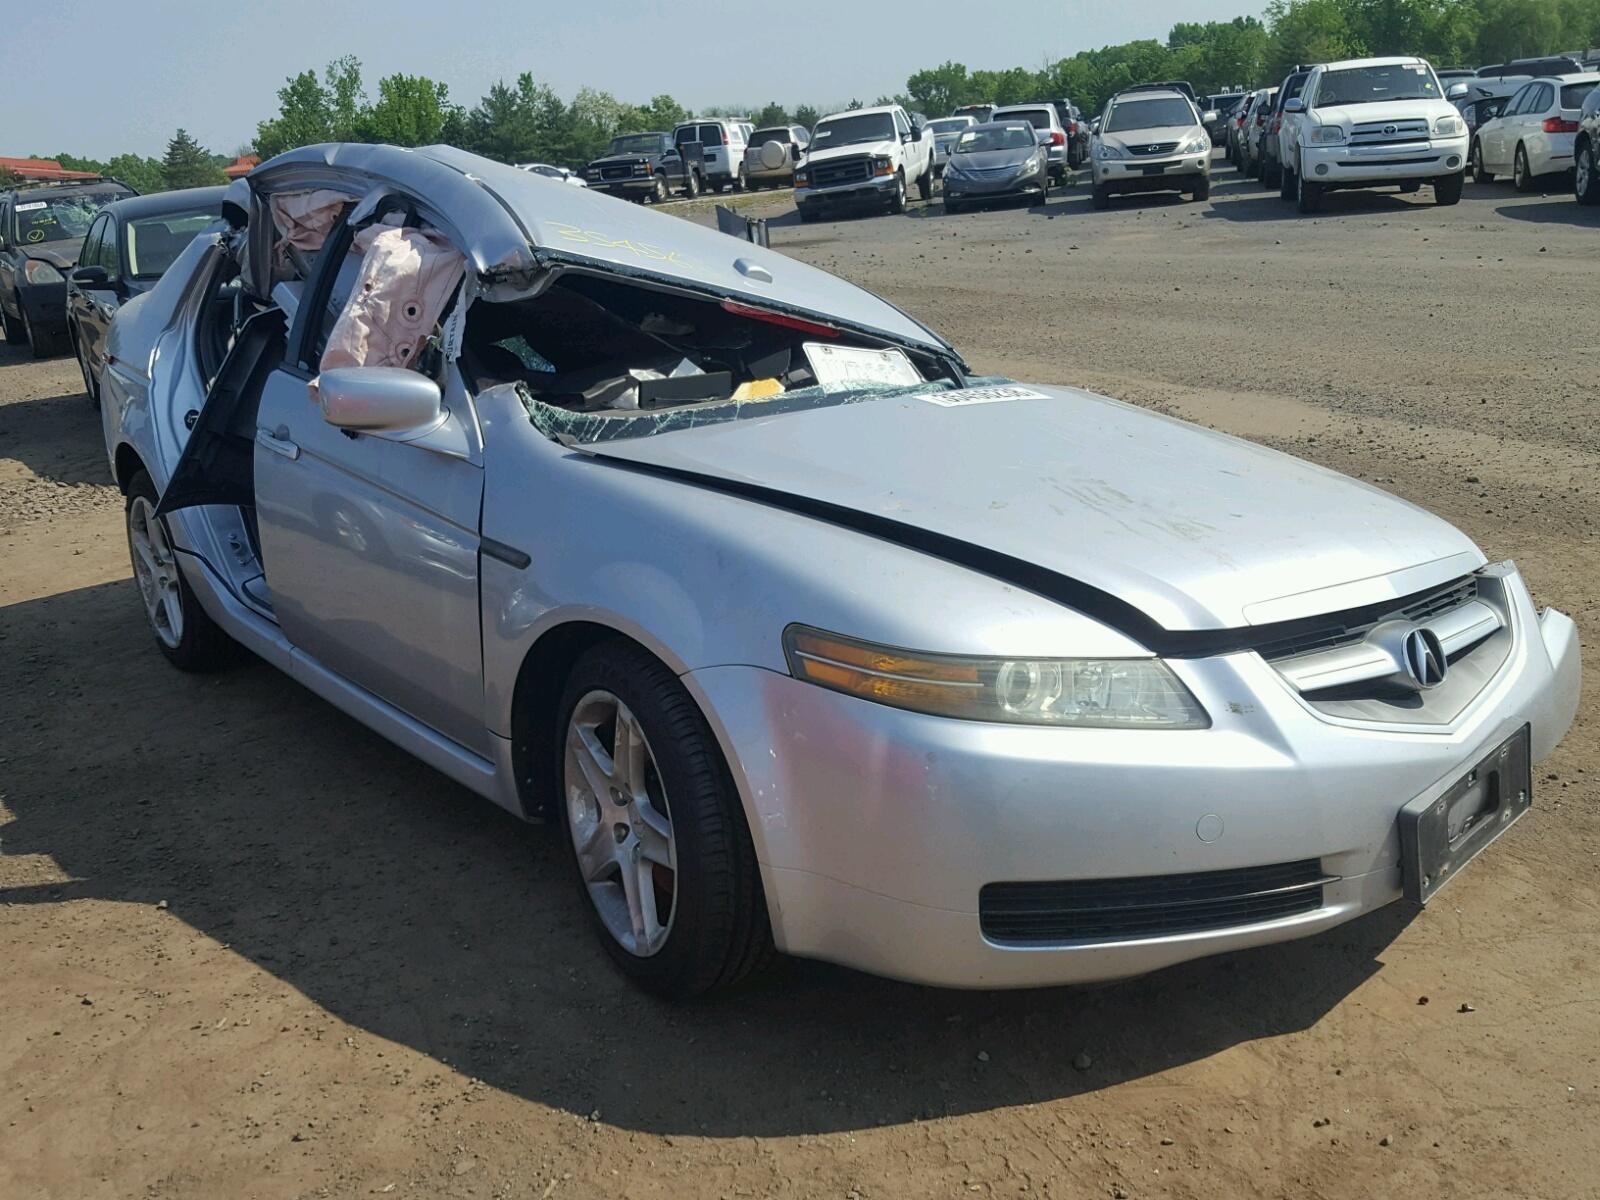 car acura htm for park silver tl navigation libertyville sedan sale used beach